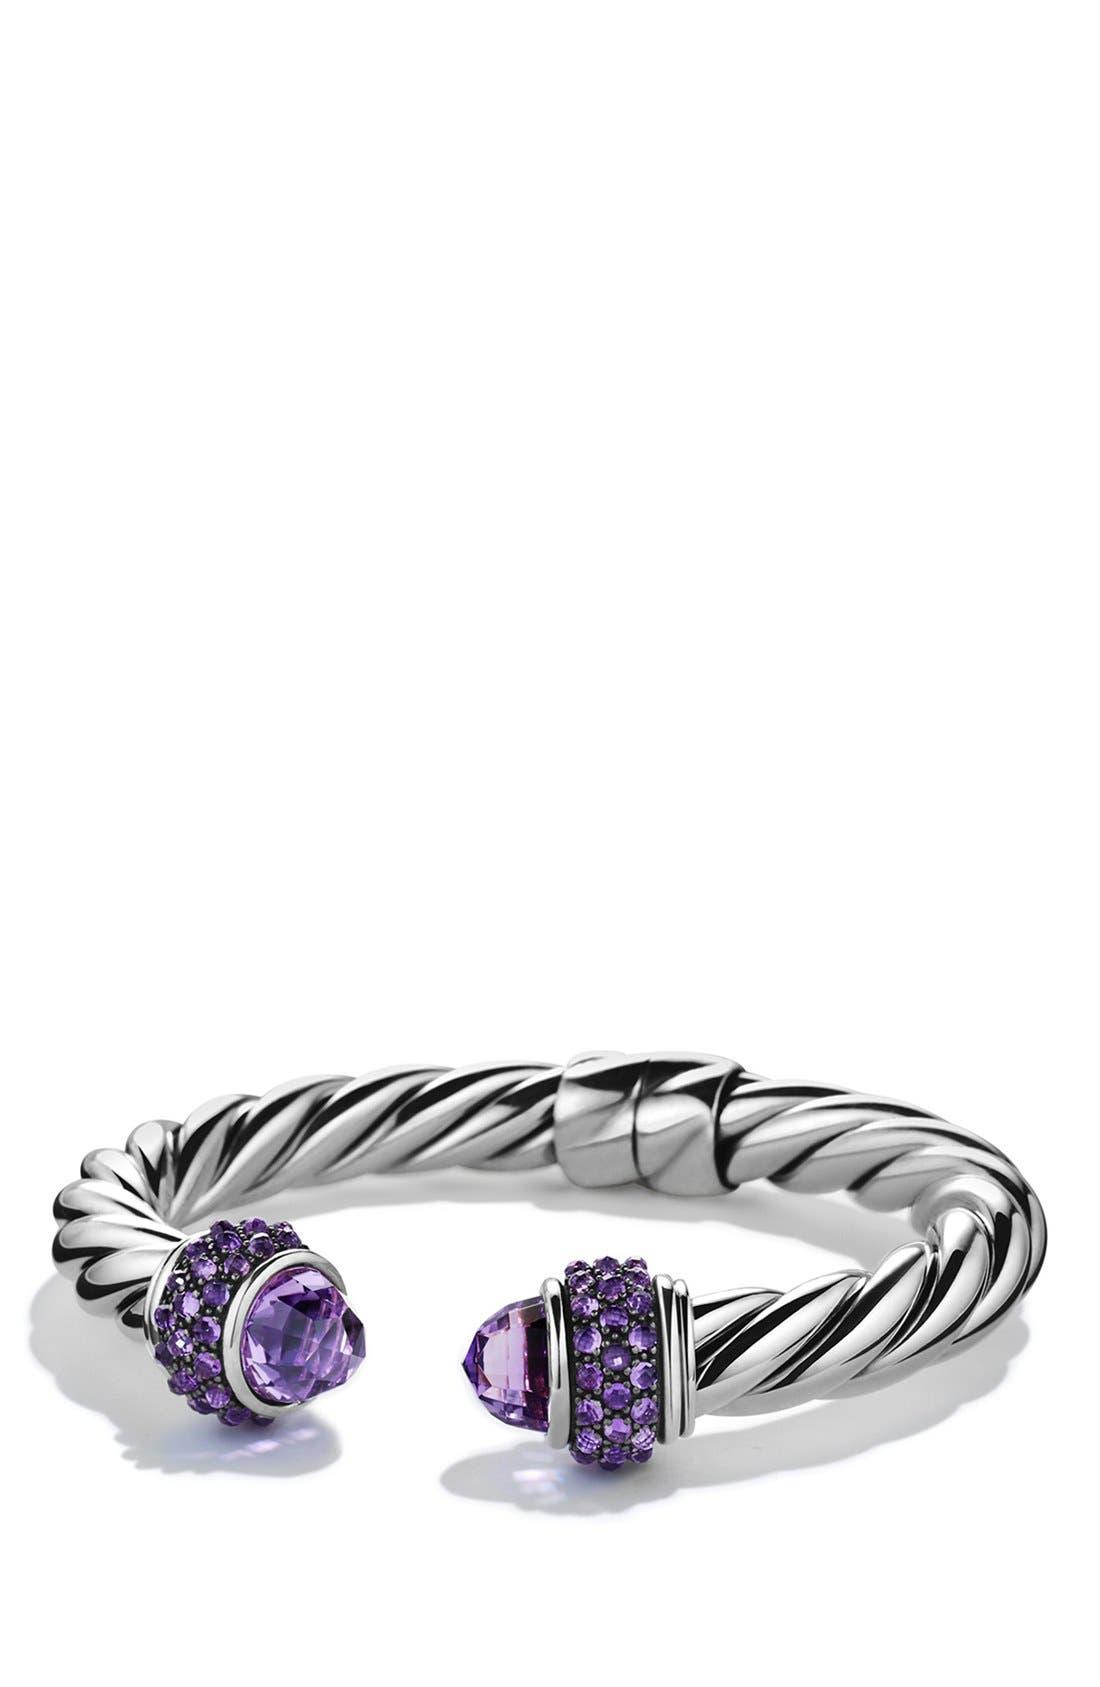 Alternate Image 1 Selected - David Yurman Bracelet with Semiprecious Stones